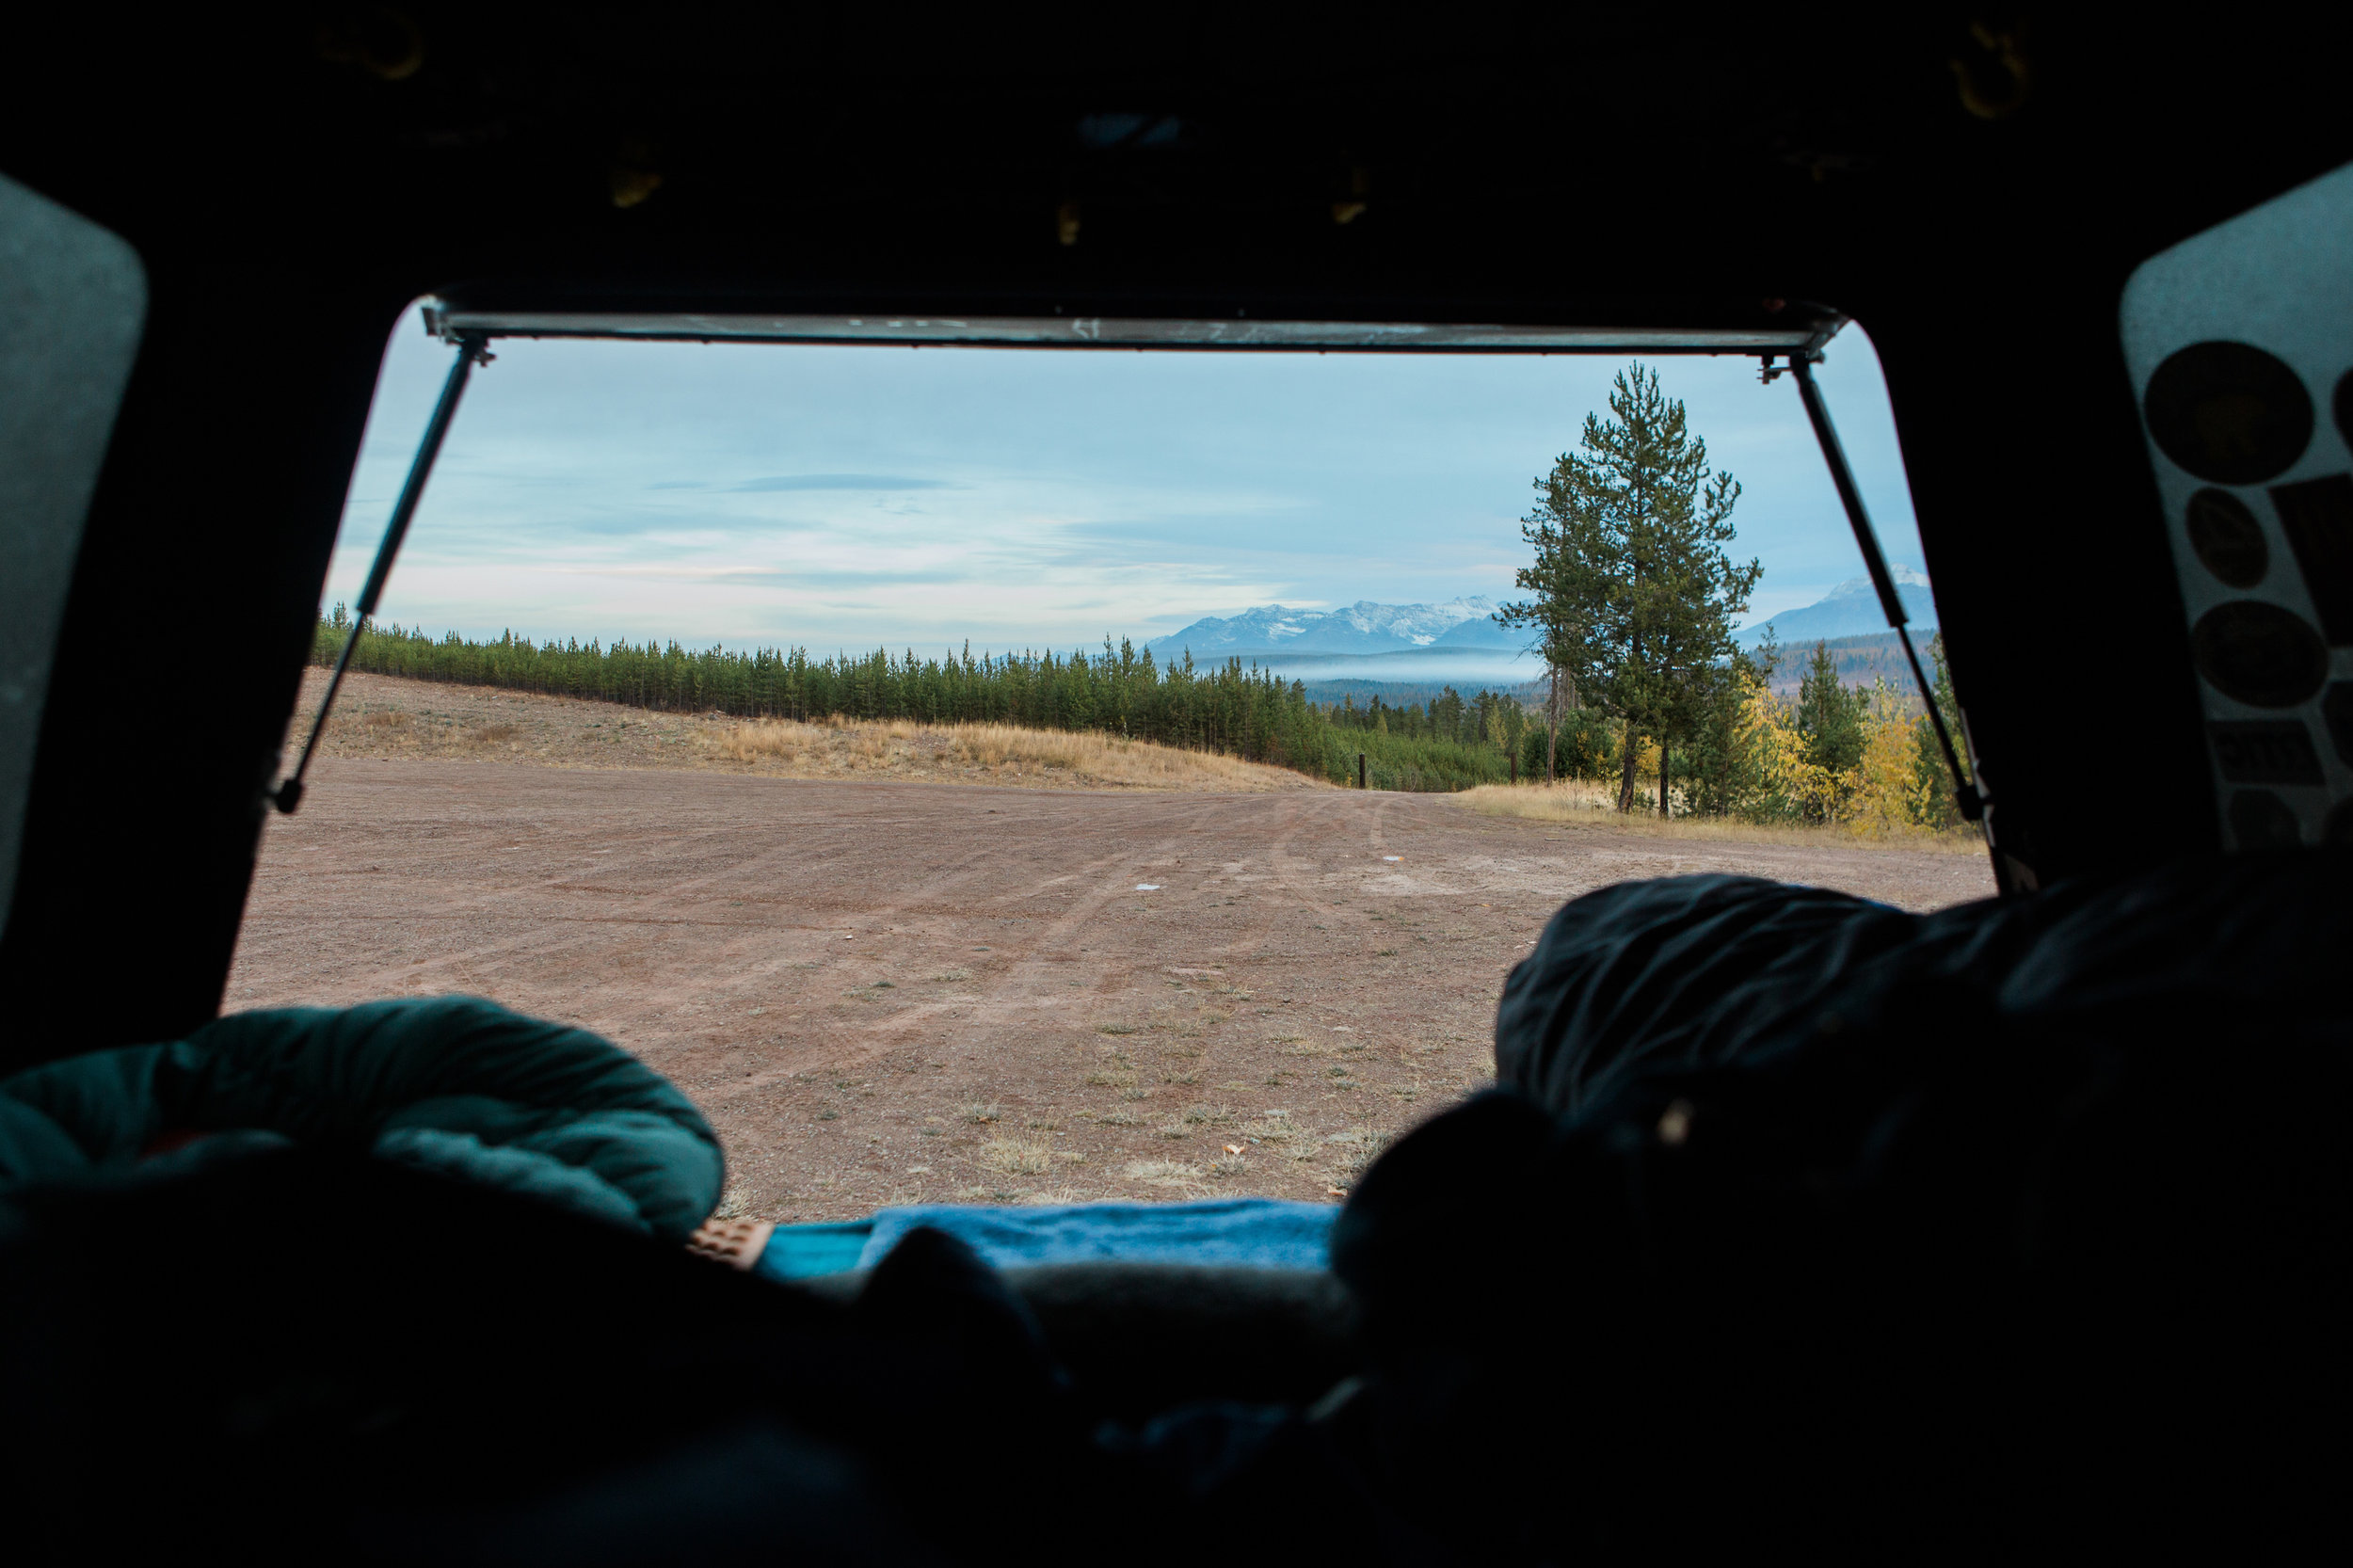 CindyGiovagnoli_Glacier_National_Park_Montana_mountains_lake_fall_autumn_road_trip-022.jpg